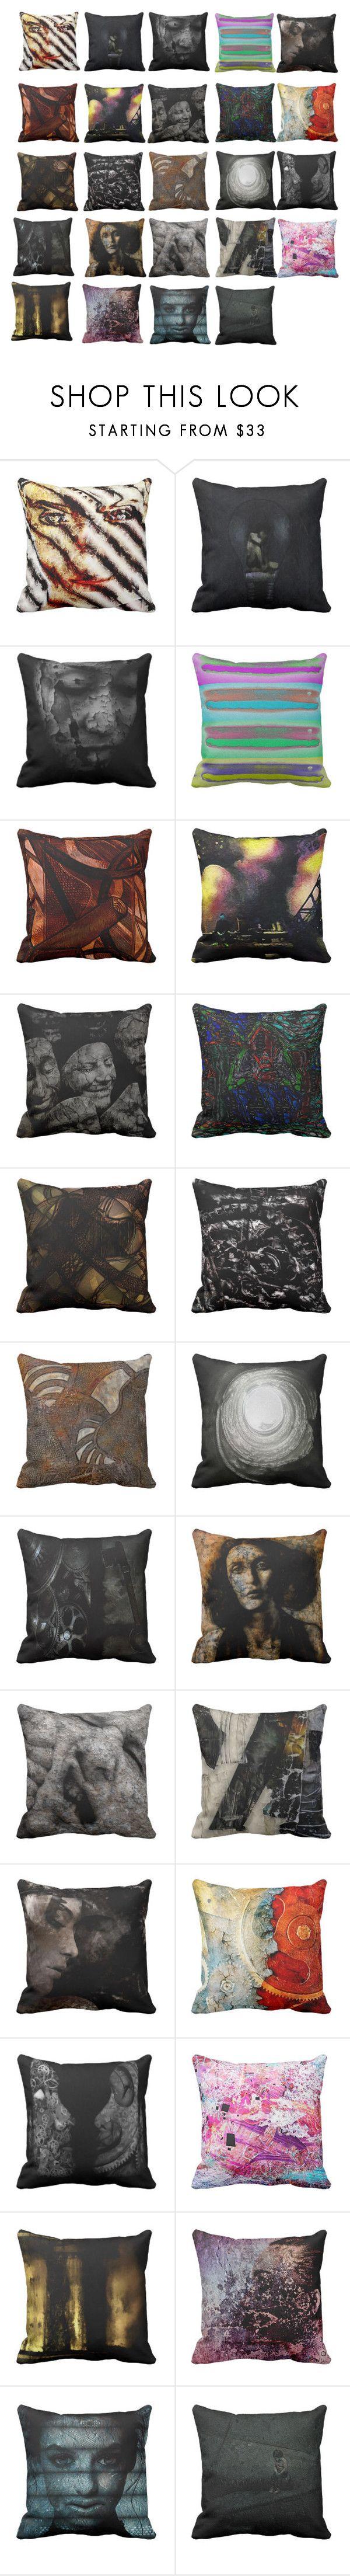 """Unique Pillow case designs"" by morrison-art on Polyvore featuring interior, interiors, interior design, home, home decor and interior decorating"